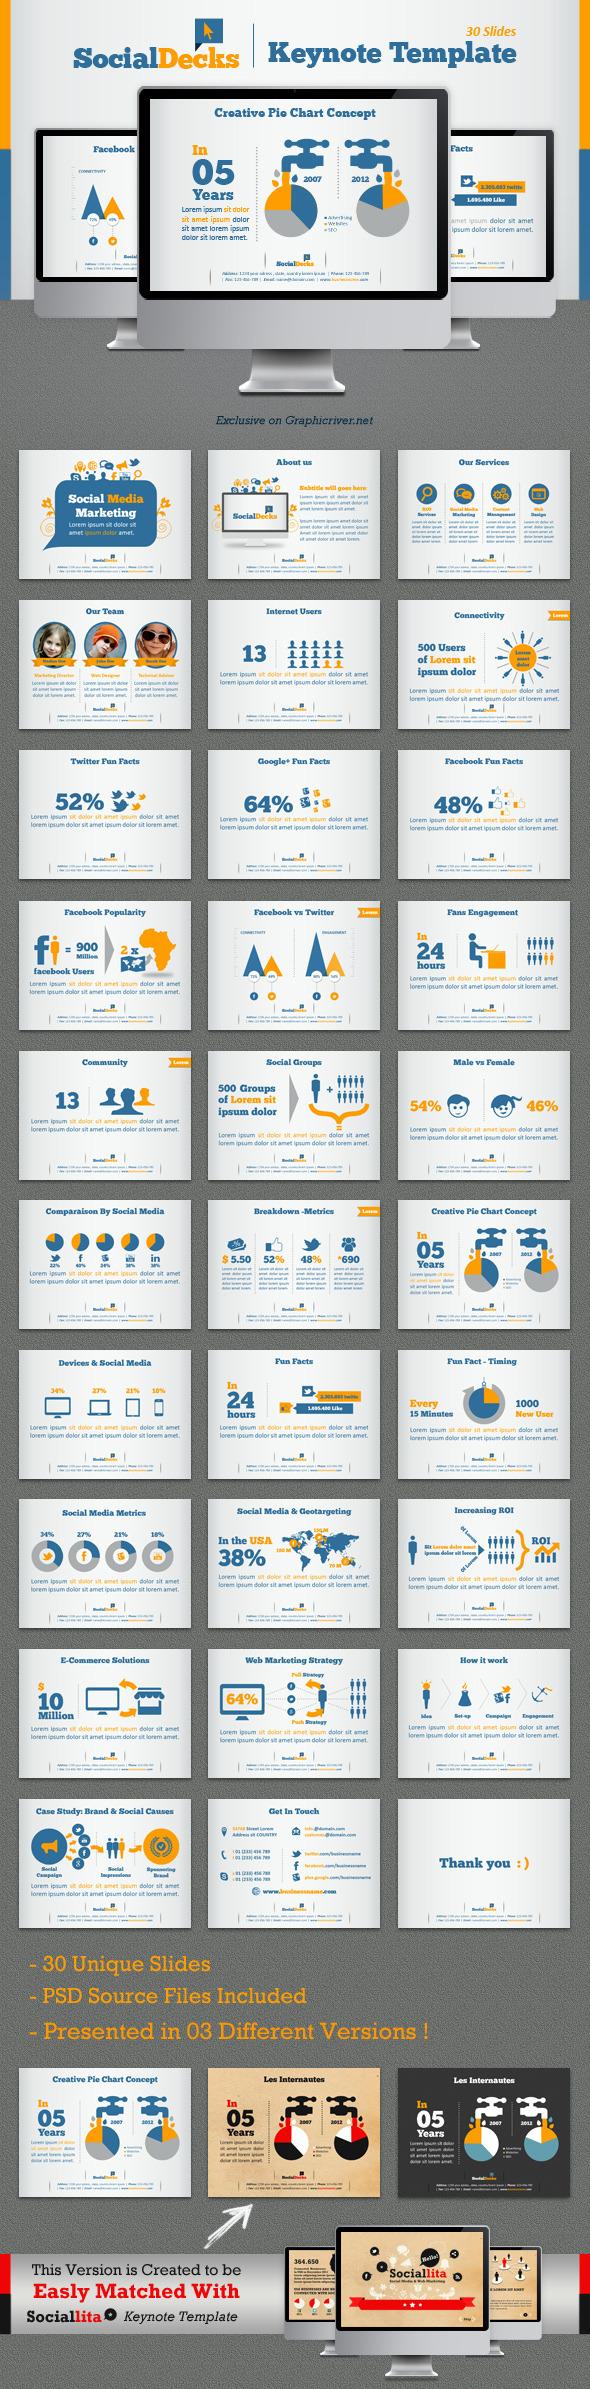 SocialDecks Keynote Template - Creative Keynote Templates